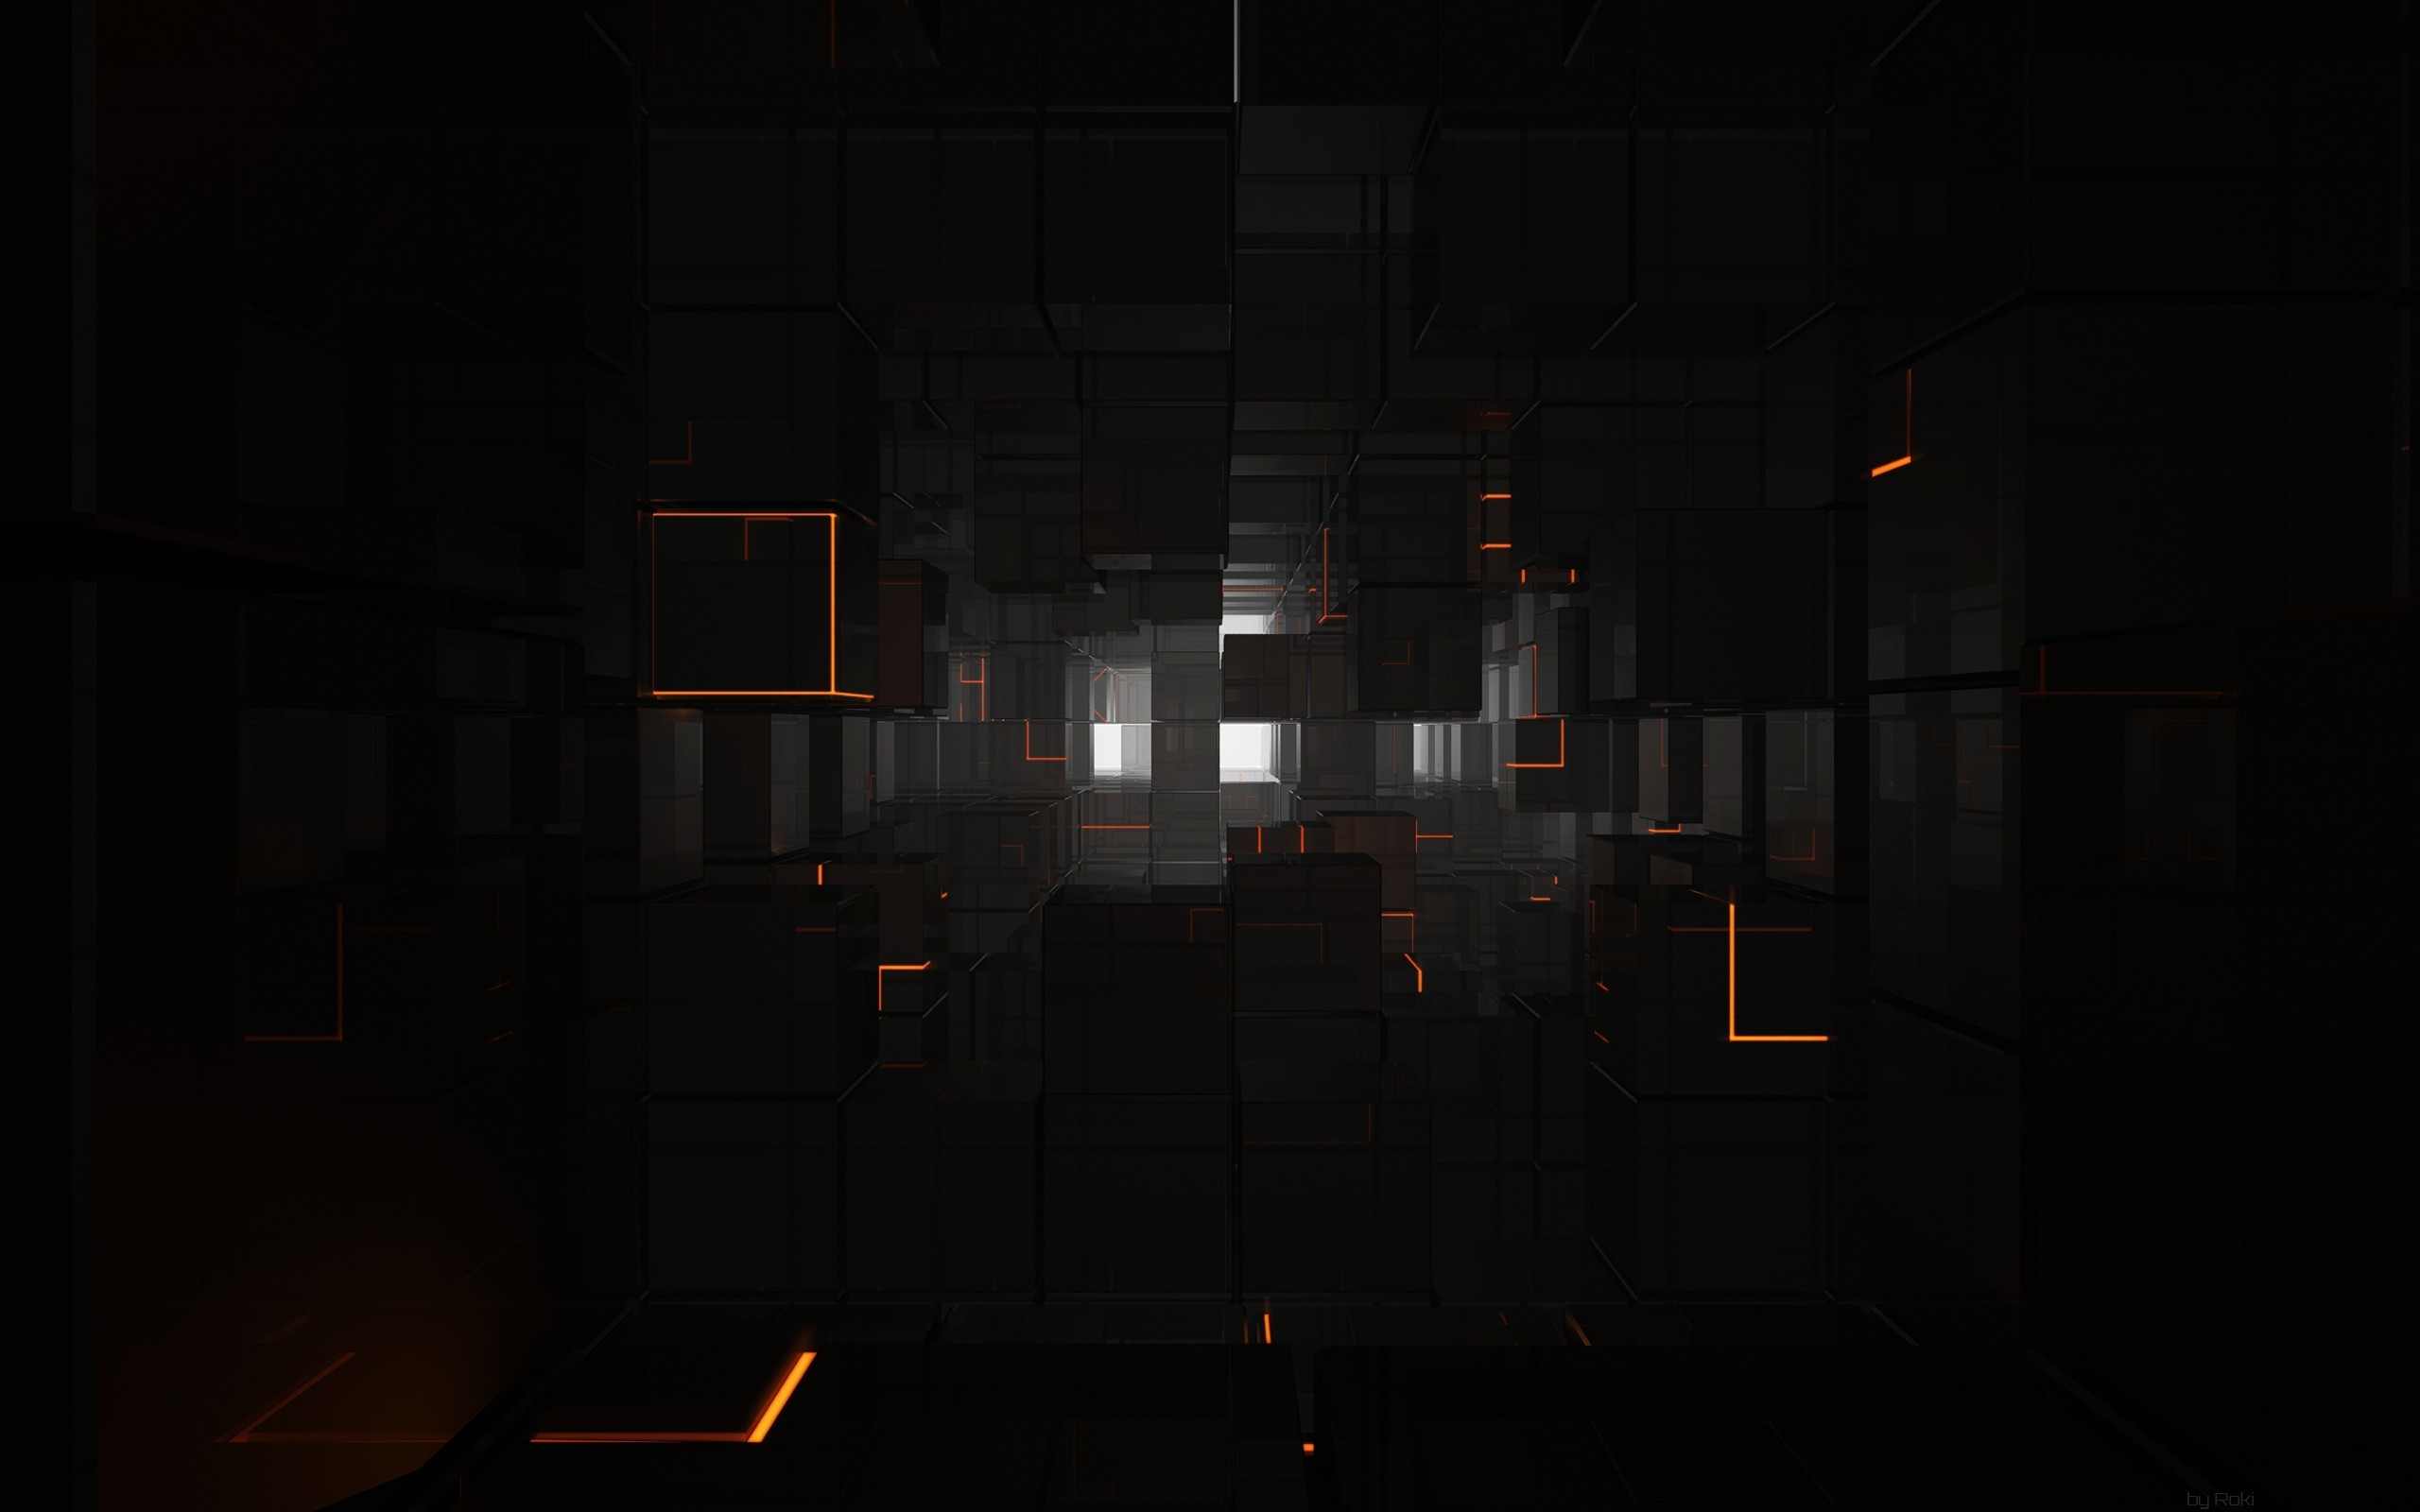 General 2560x1600 cube black orange white shiny reflection 3D digital art 3D Blocks render CGI dark abstract 3D Abstract